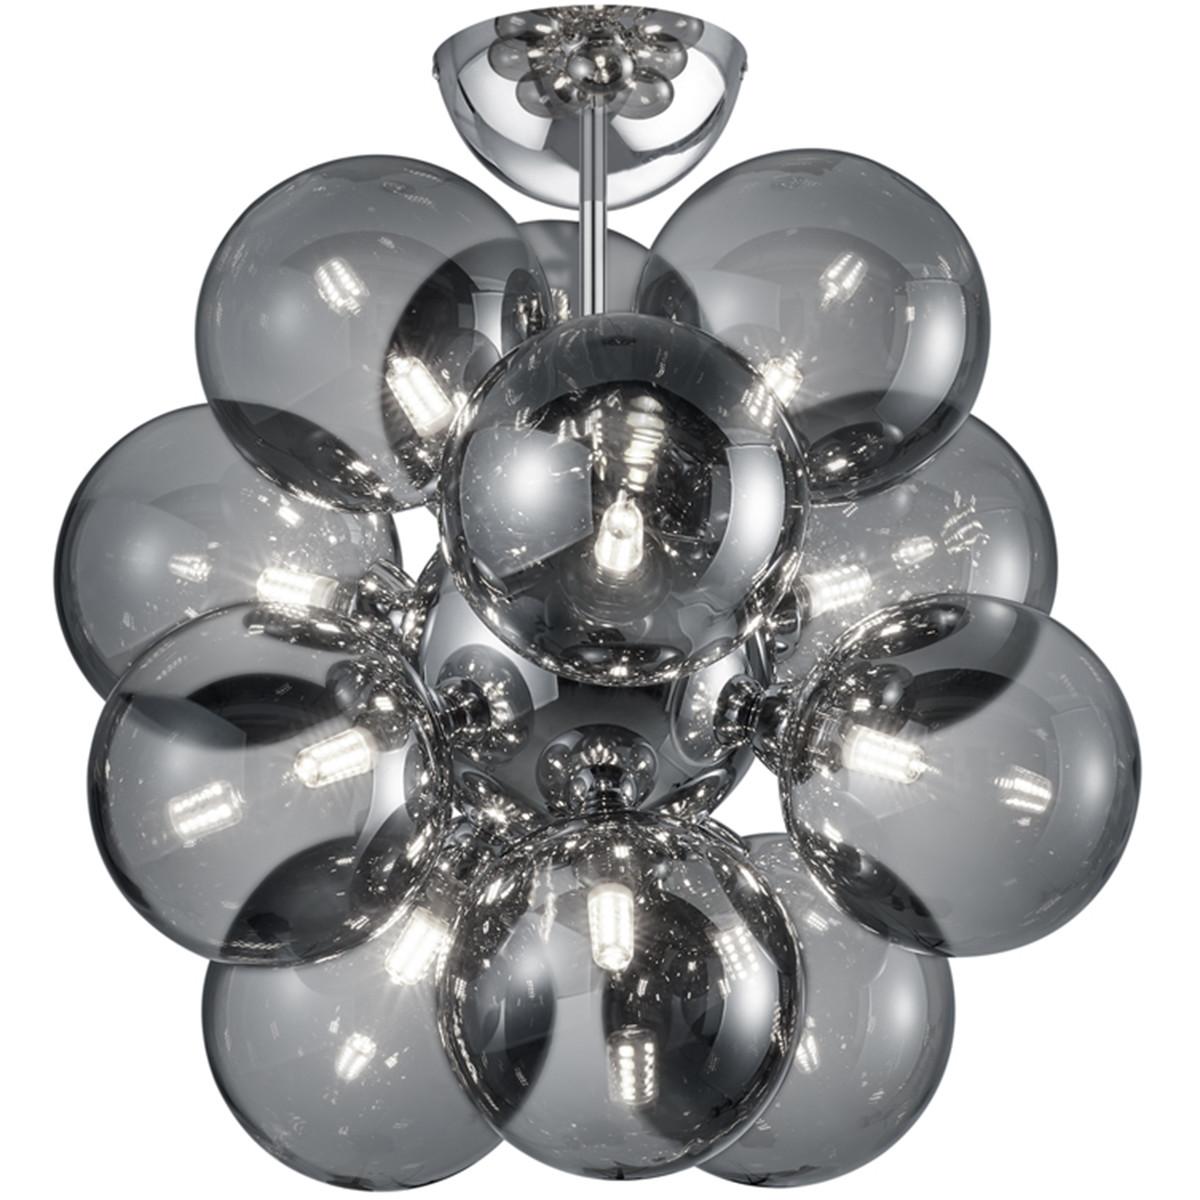 LED Plafondlamp - Plafondverlichting - Trion Alionisa - G9 Fitting - 12-lichts - Rond - Glans Chroom